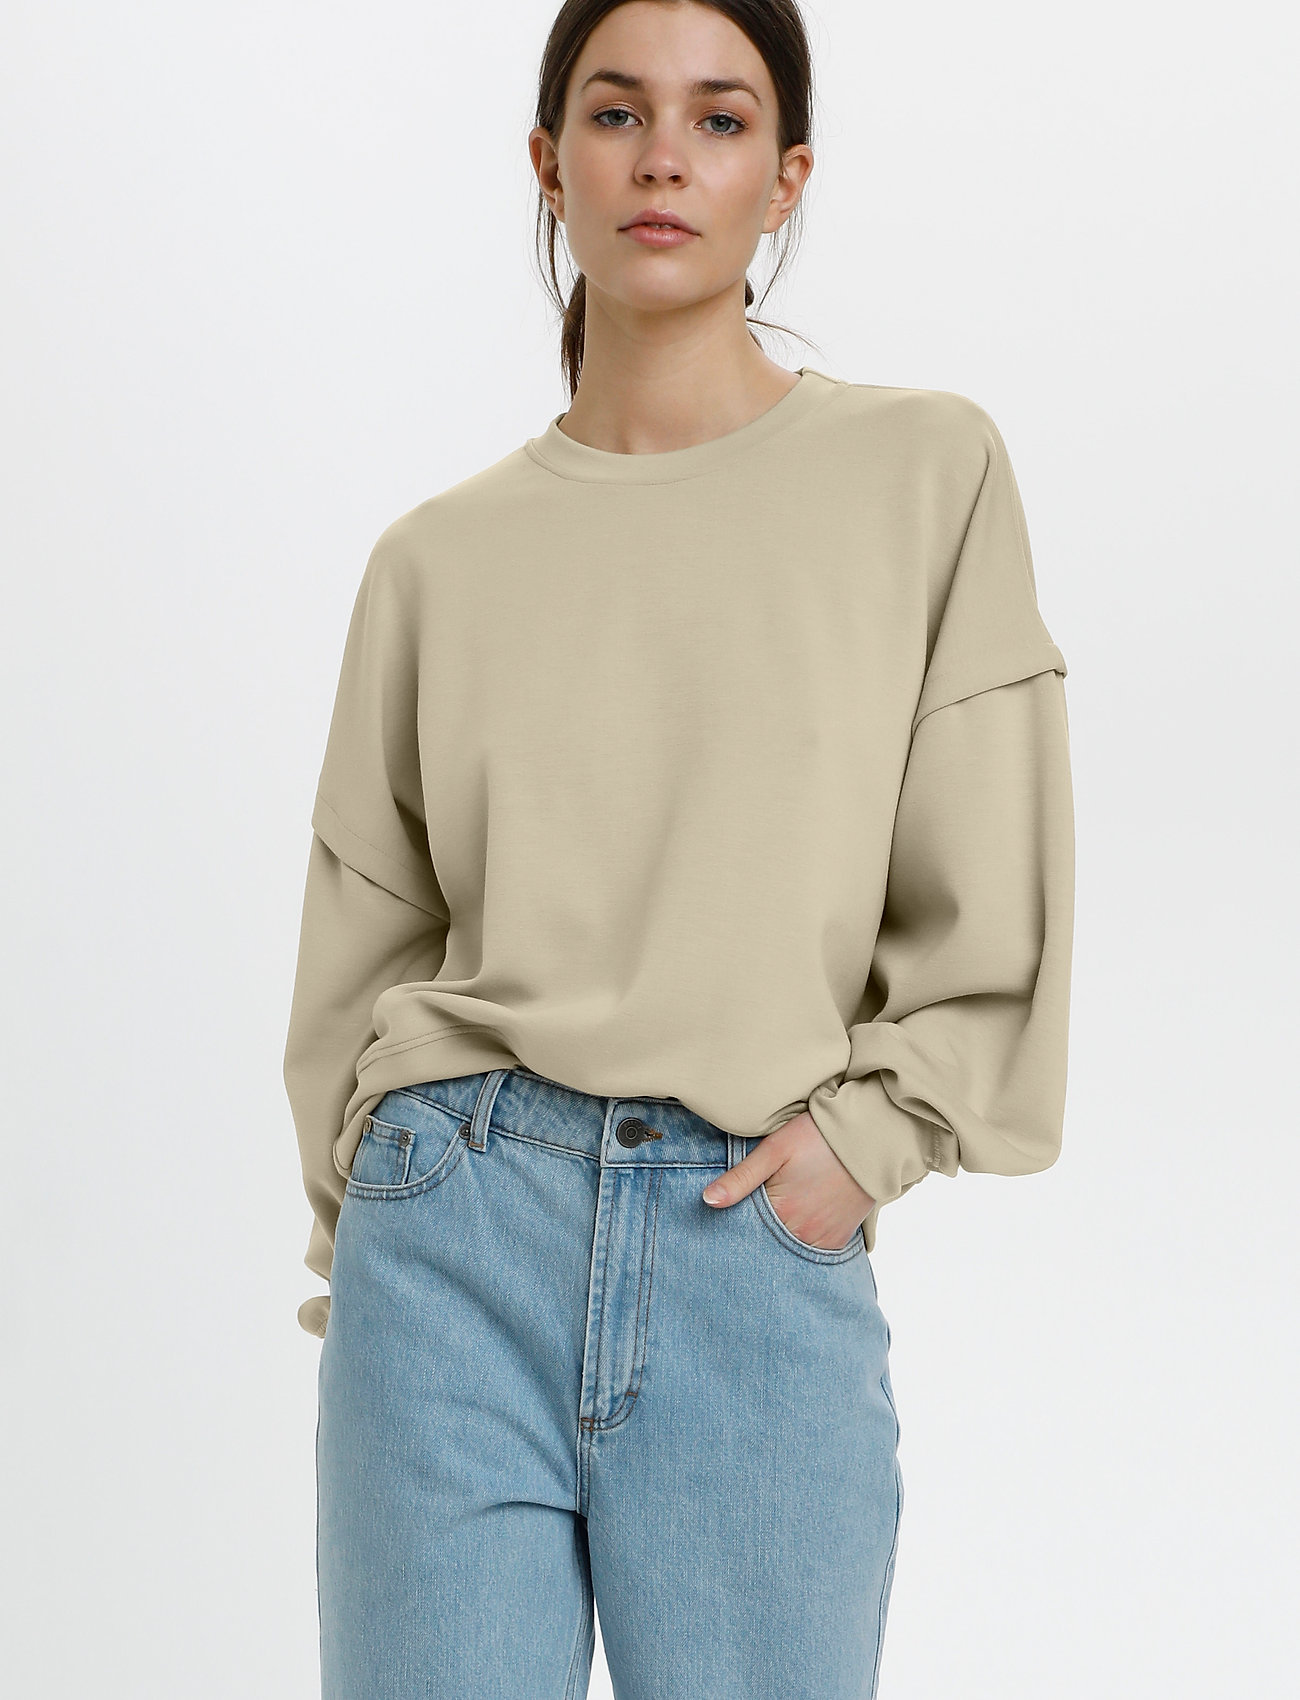 Gestuz - ChrisdaGZ sweatshirt - sweatshirts - pure cashmere - 0